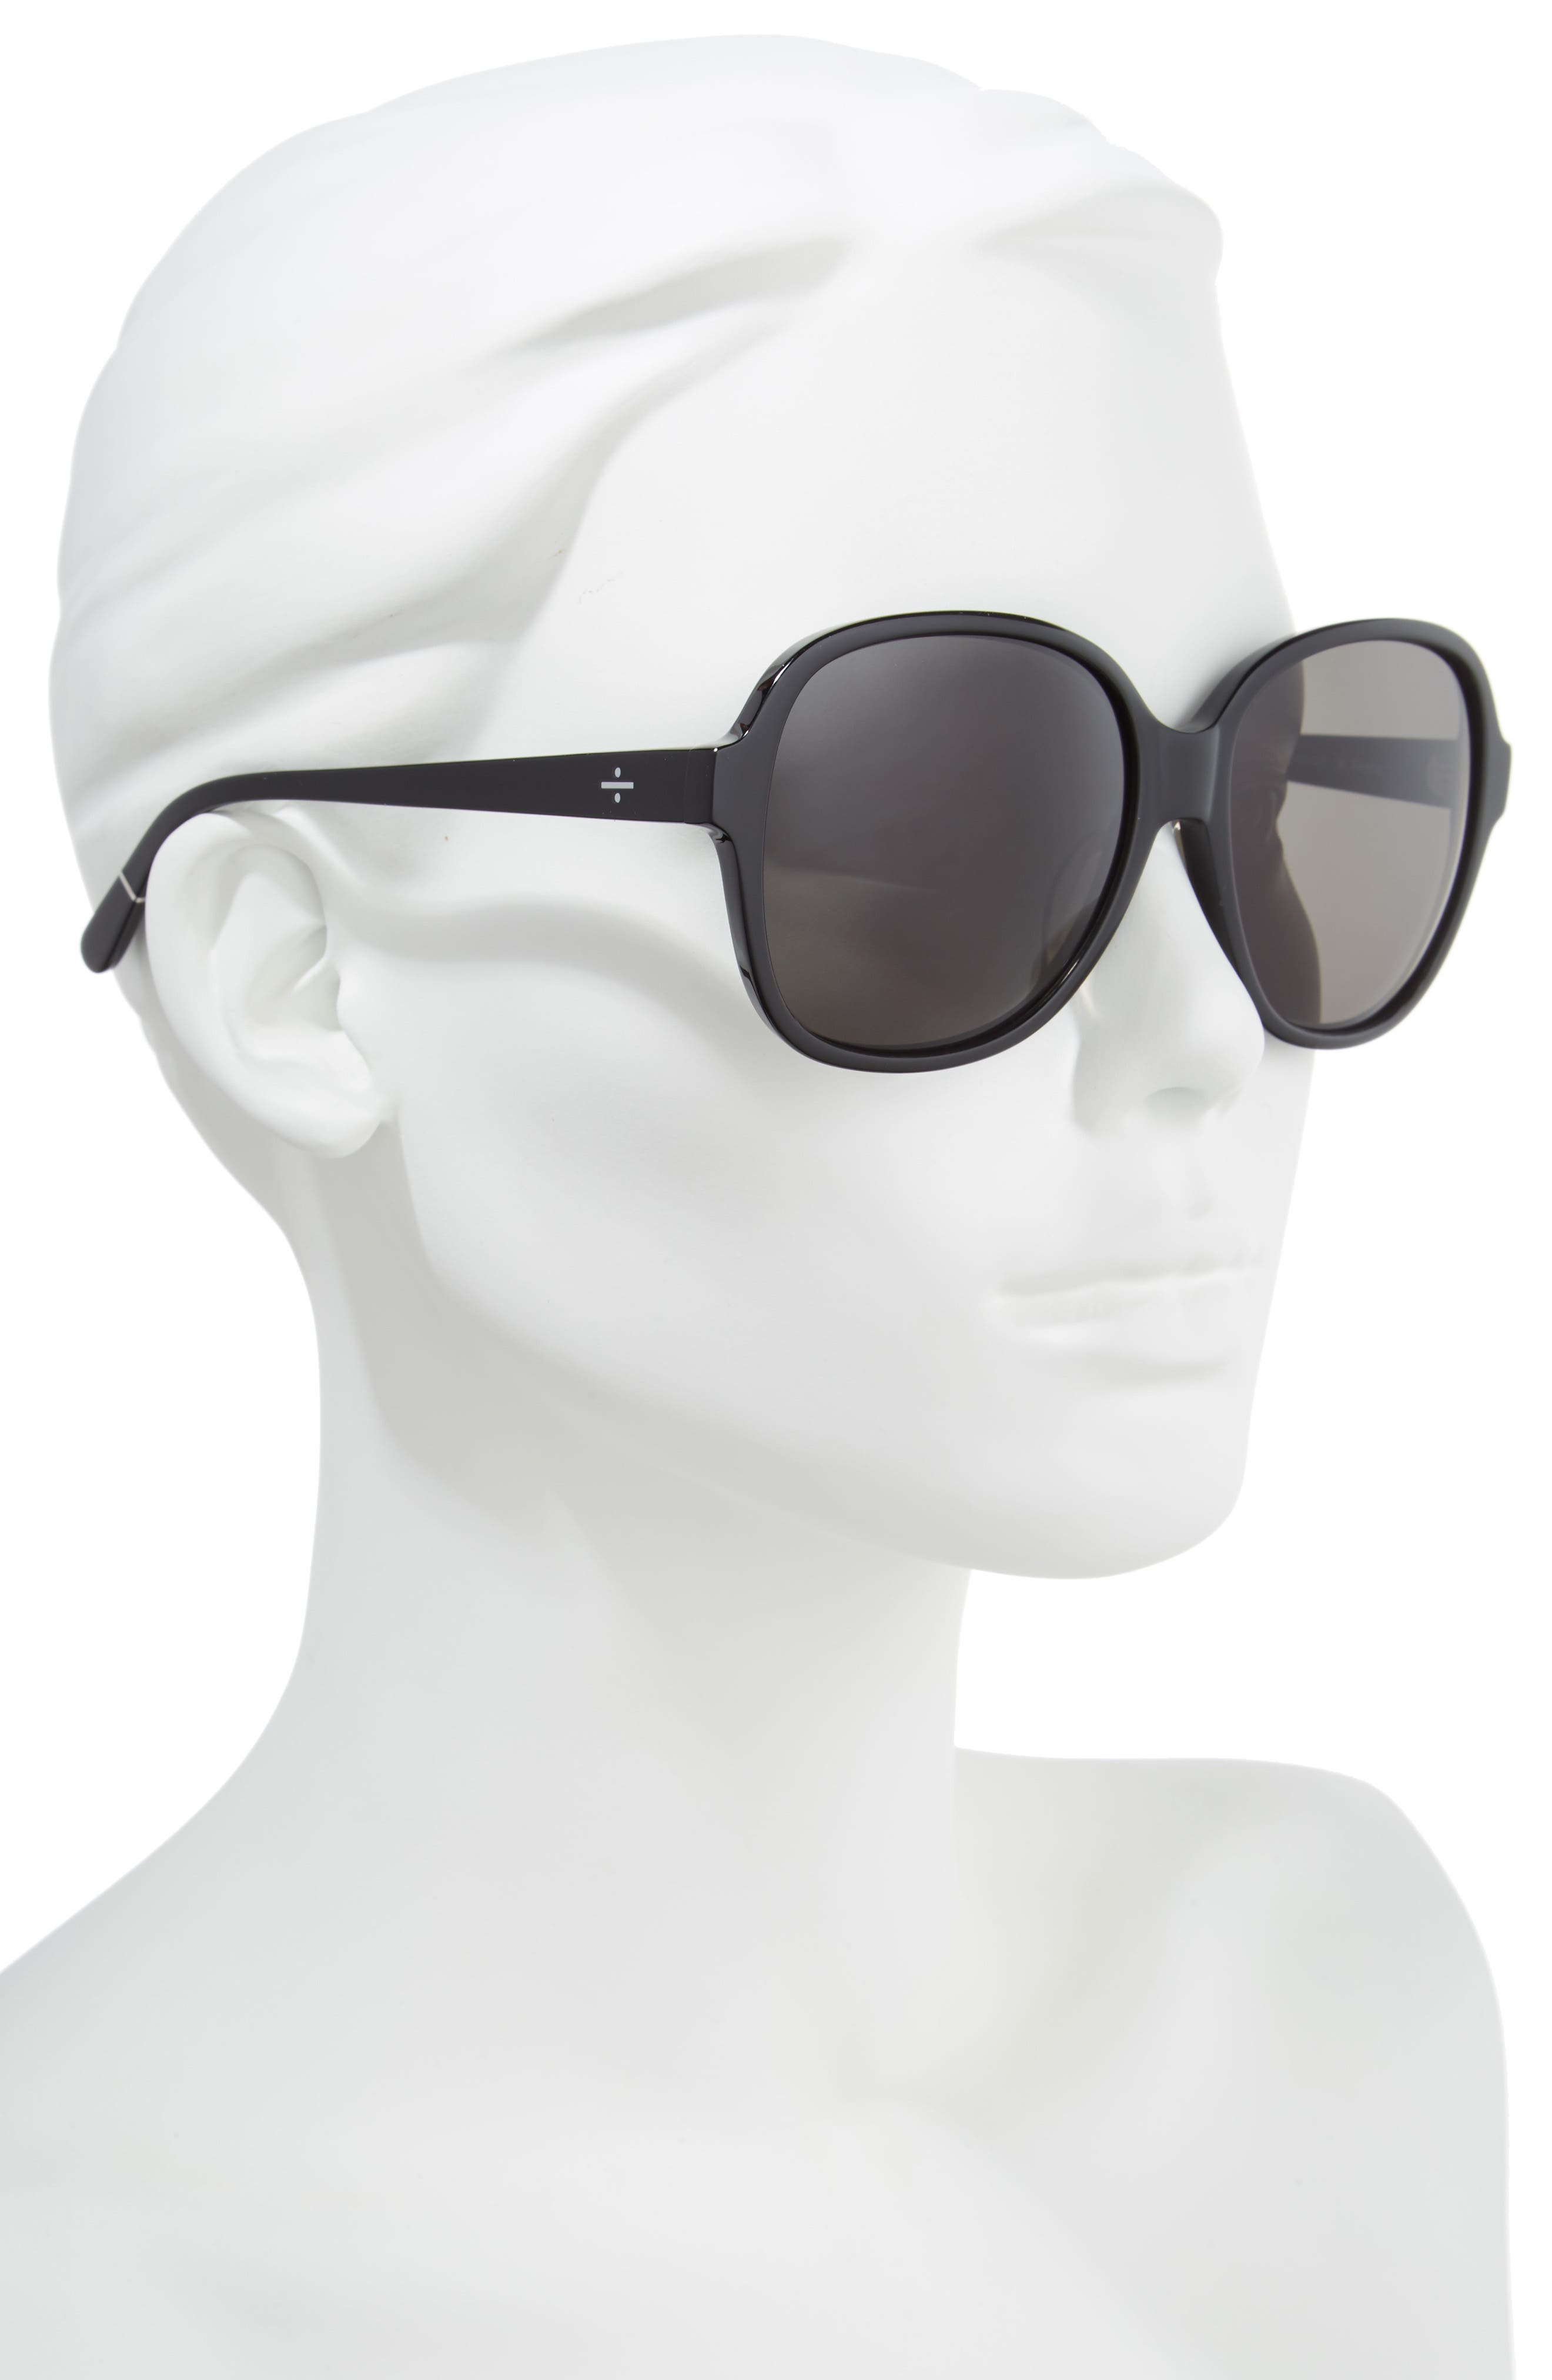 BLANC & ECLARE Beijing 61mm Polarized Sunglasses,                             Alternate thumbnail 2, color,                             BLACK